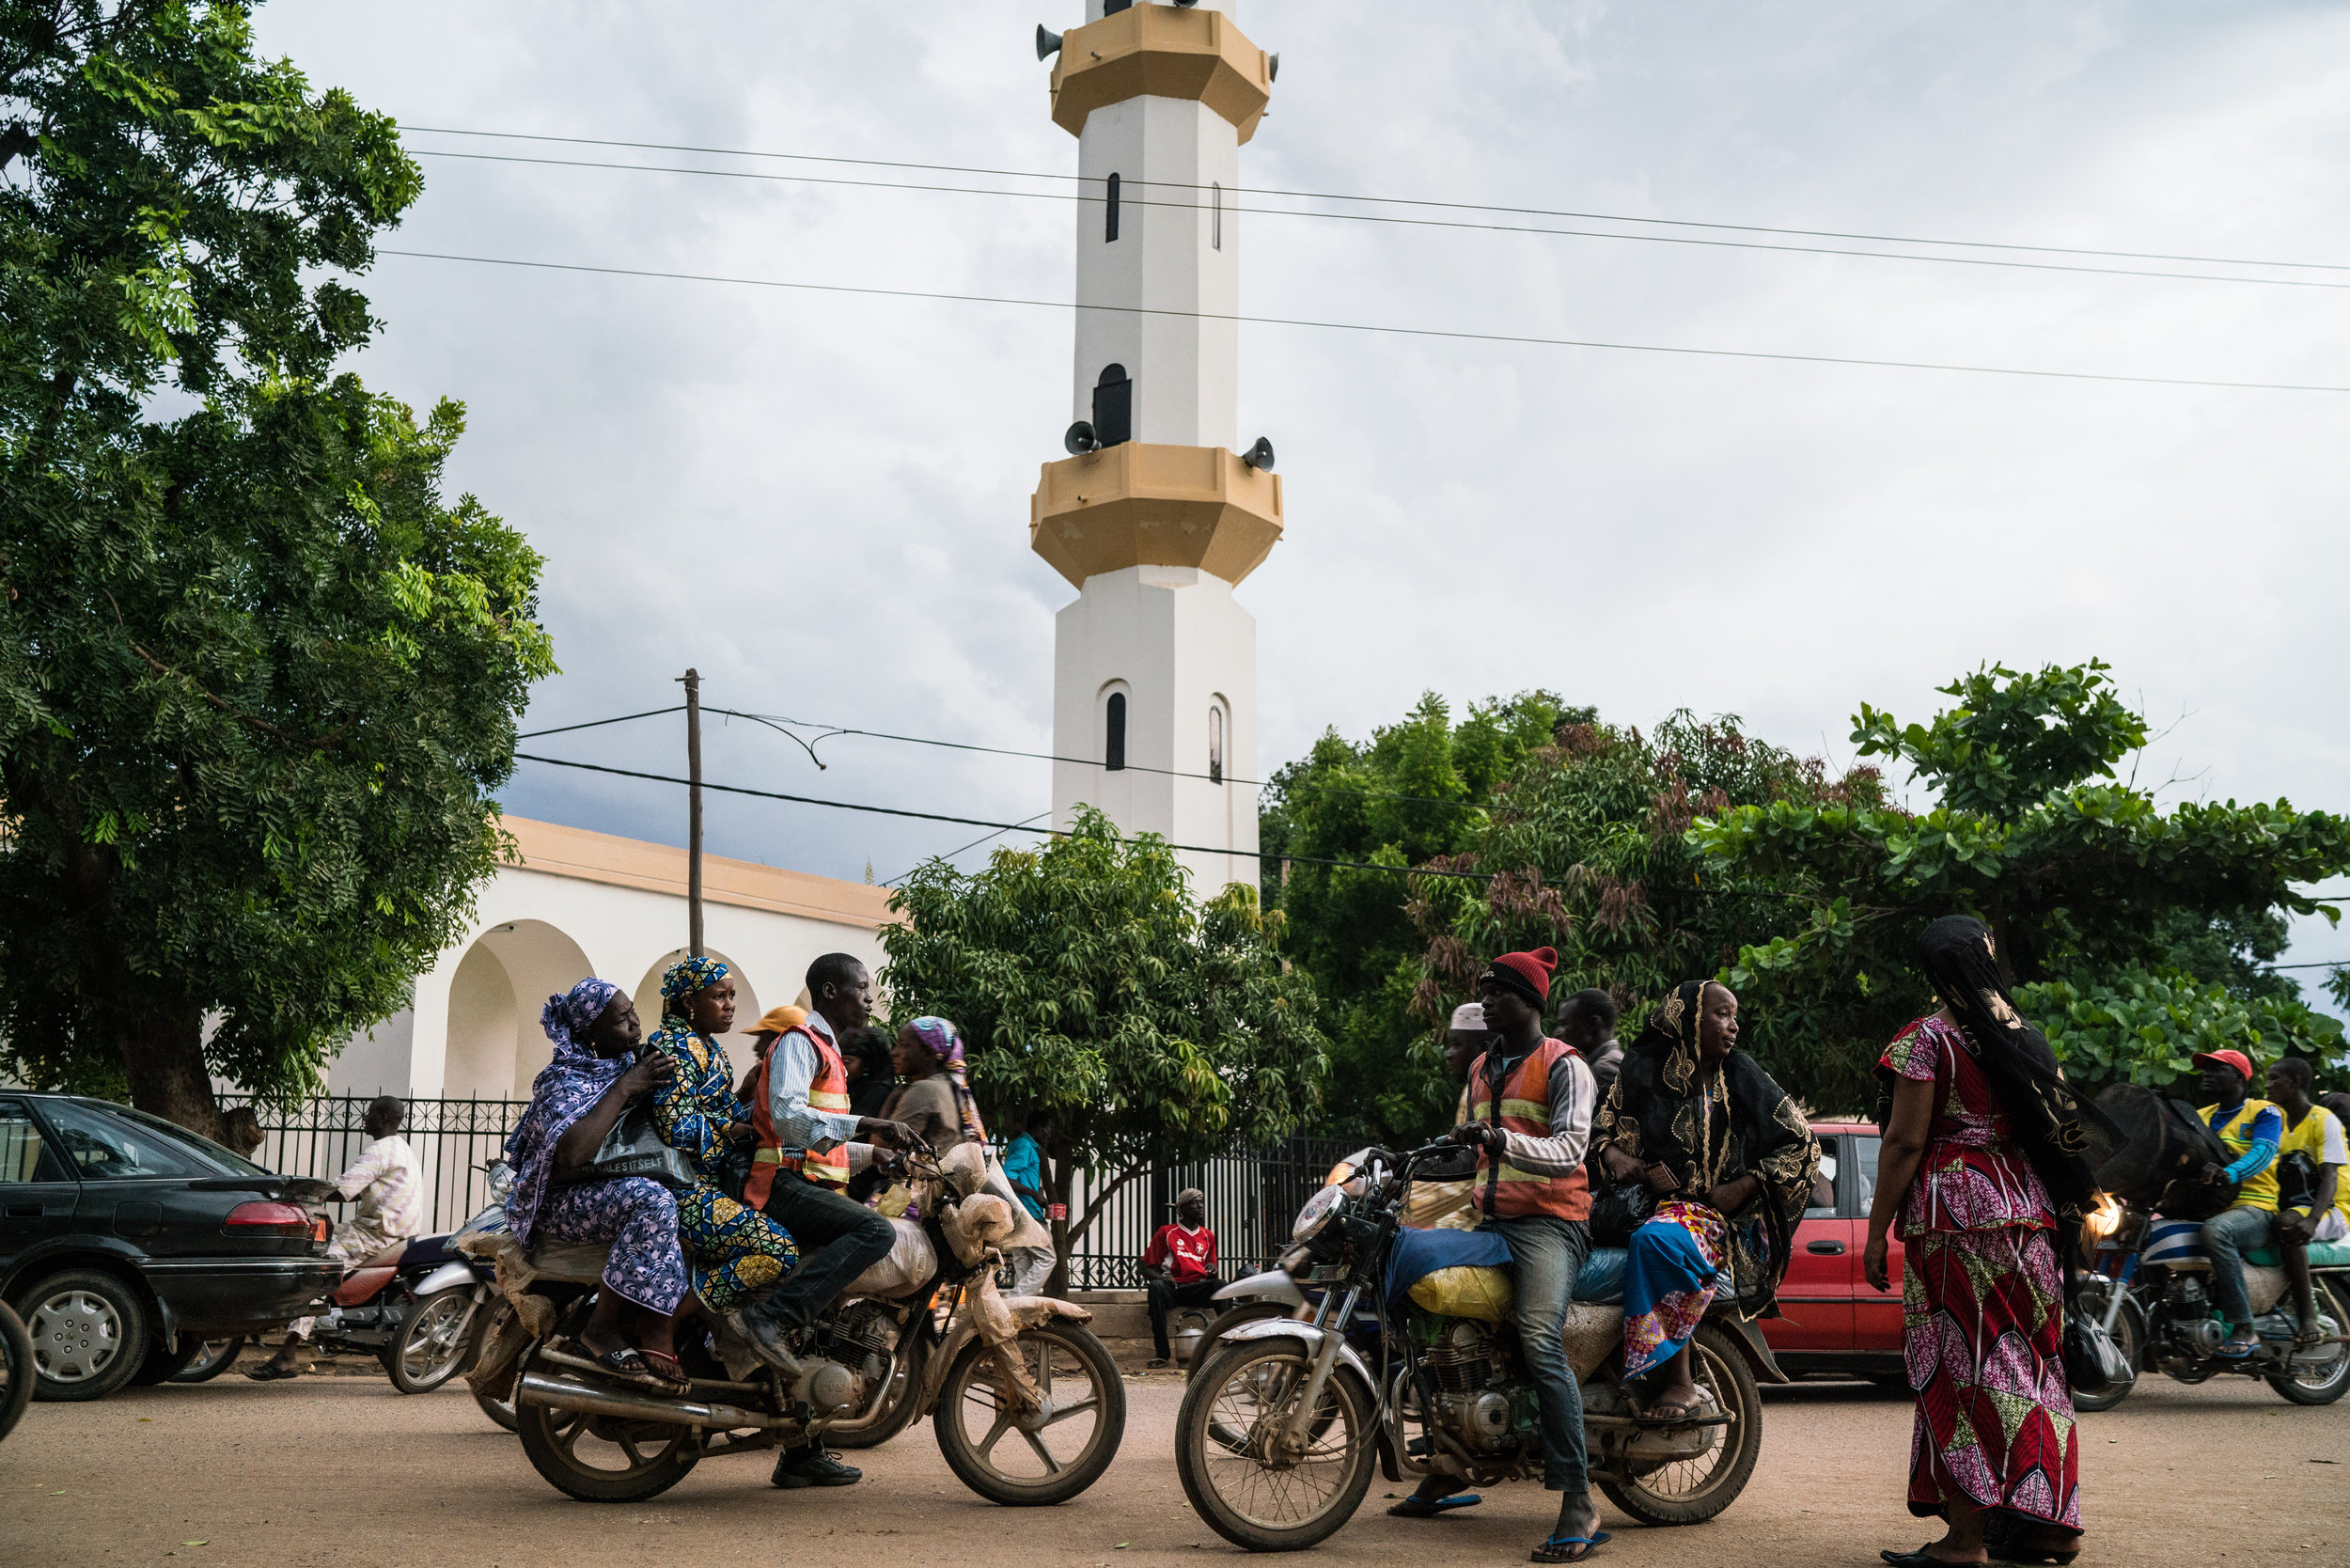 Women climb on board moto-taxis outside a mosque in Garoua, Cameroon.